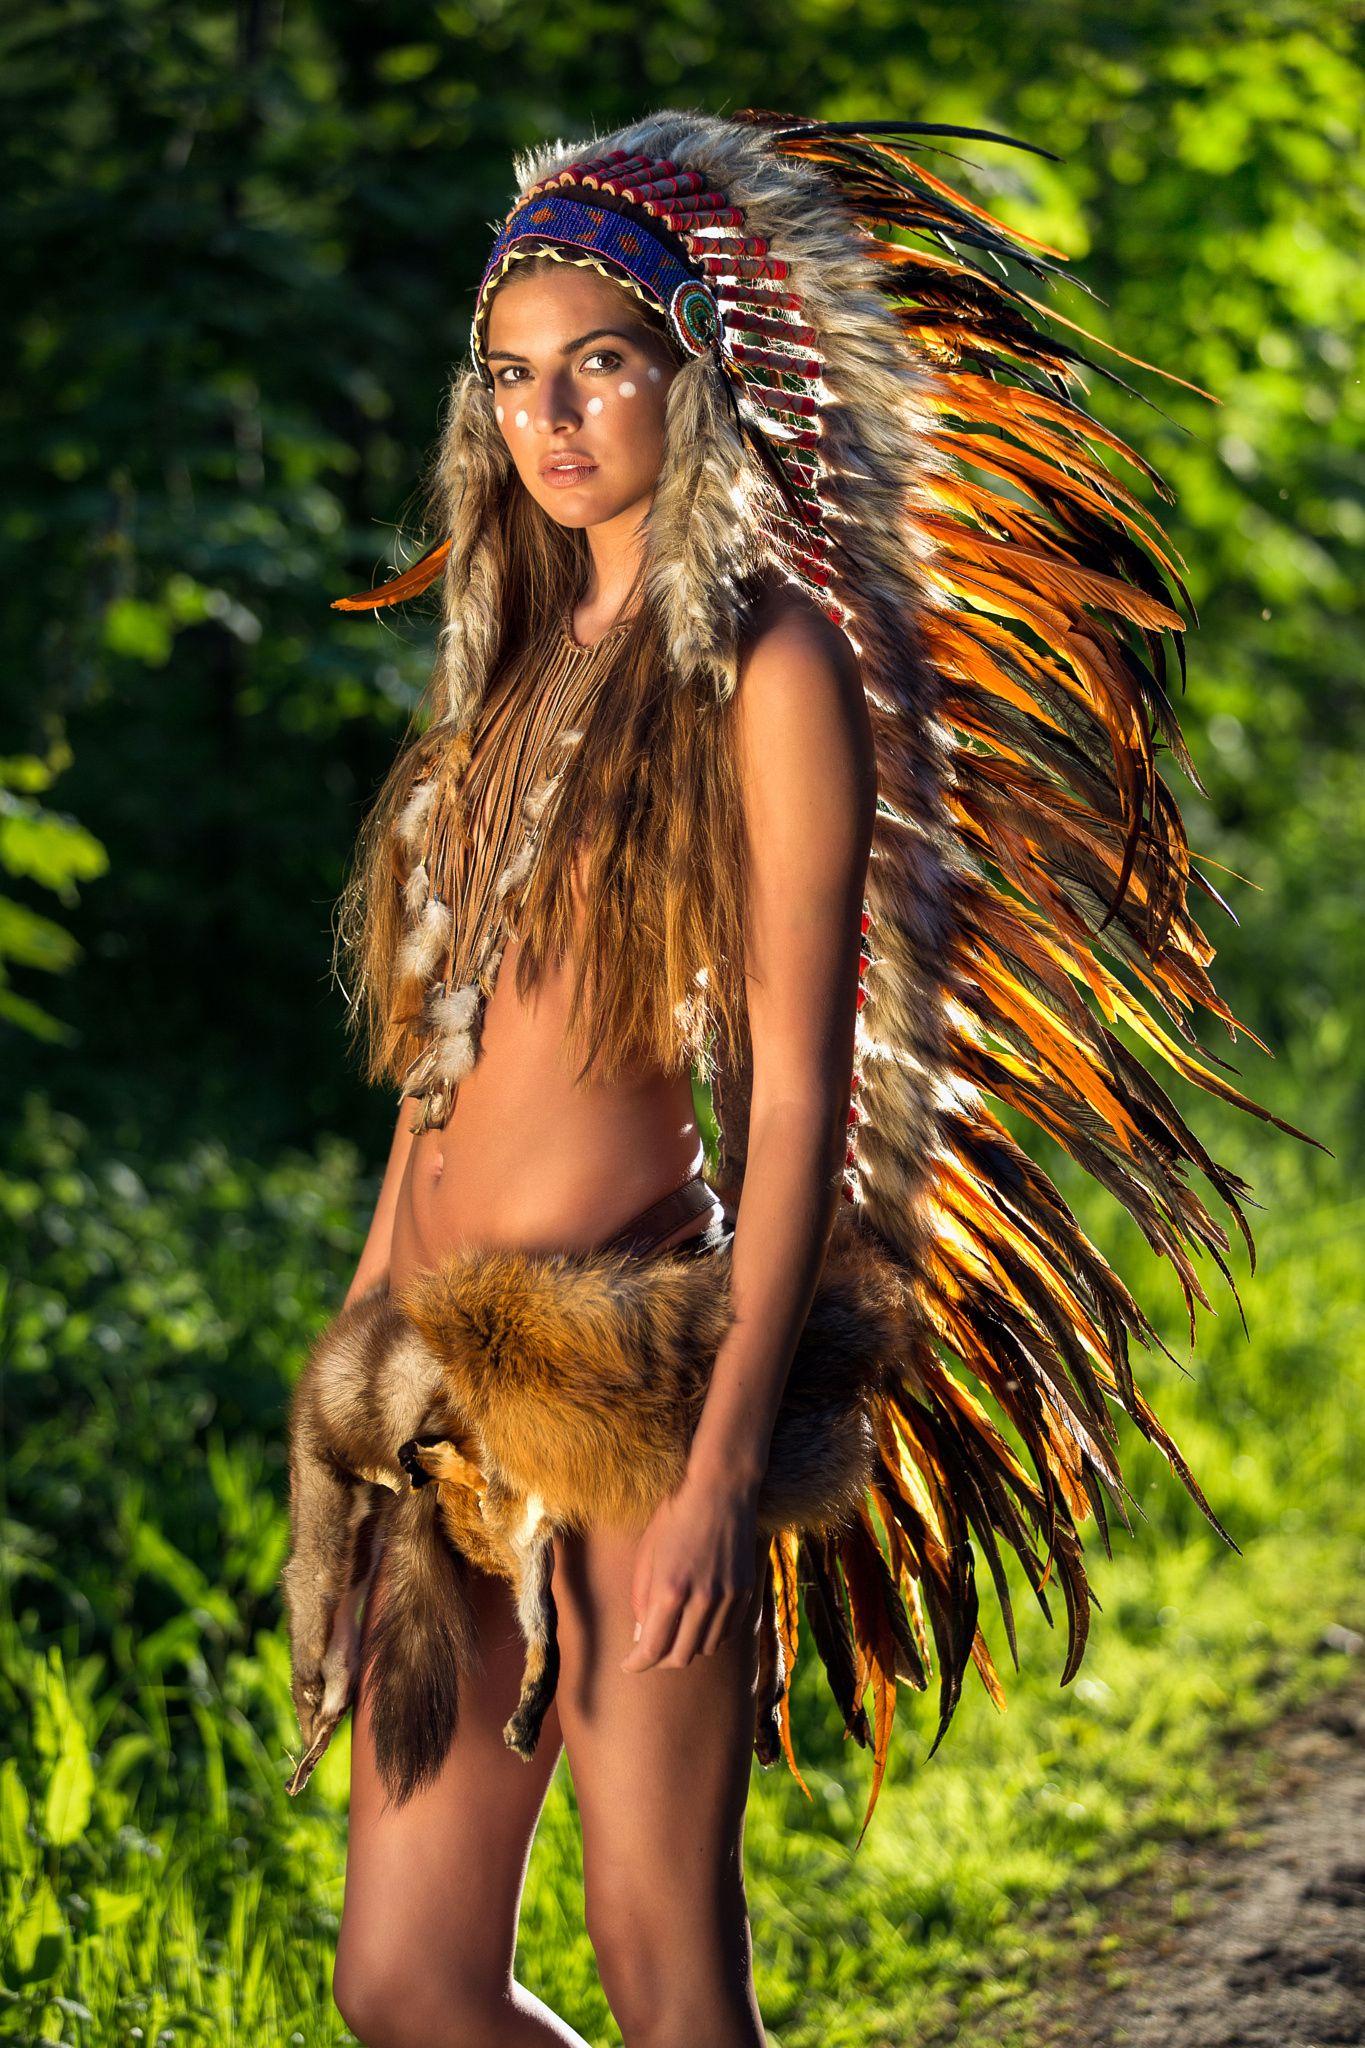 Native americans hot women